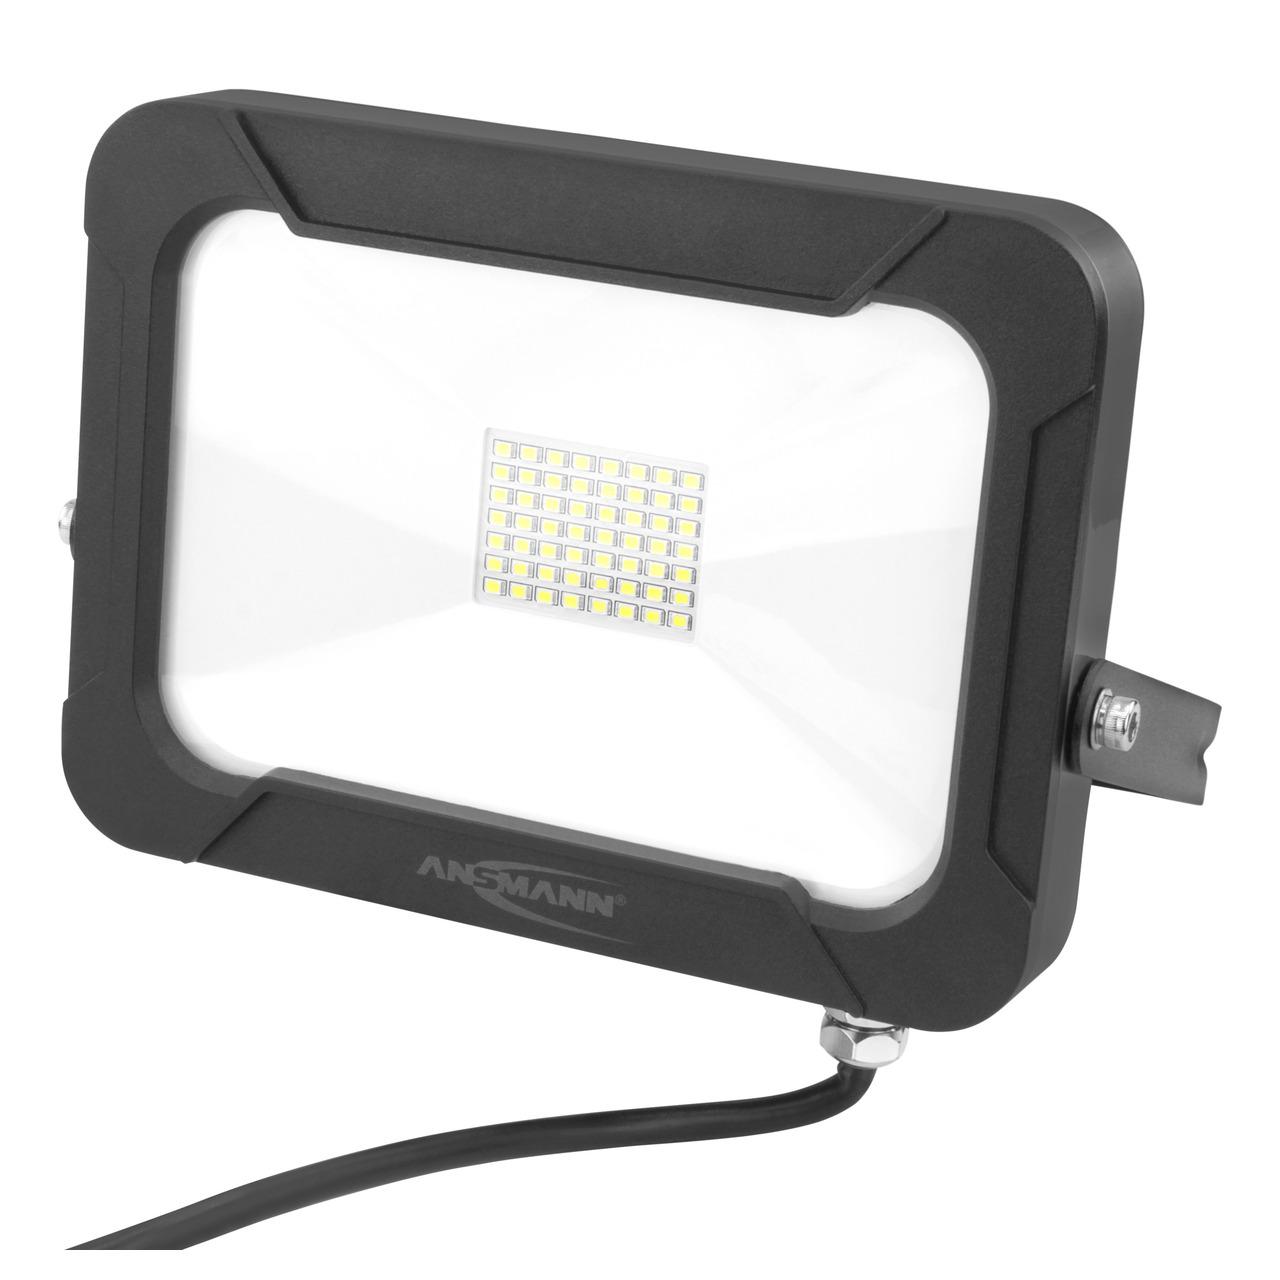 Ansmann 30-W-LED-Flutlichtstrahler WFL2400AC- 2400 lm- 5000 K- IP54- schwarz